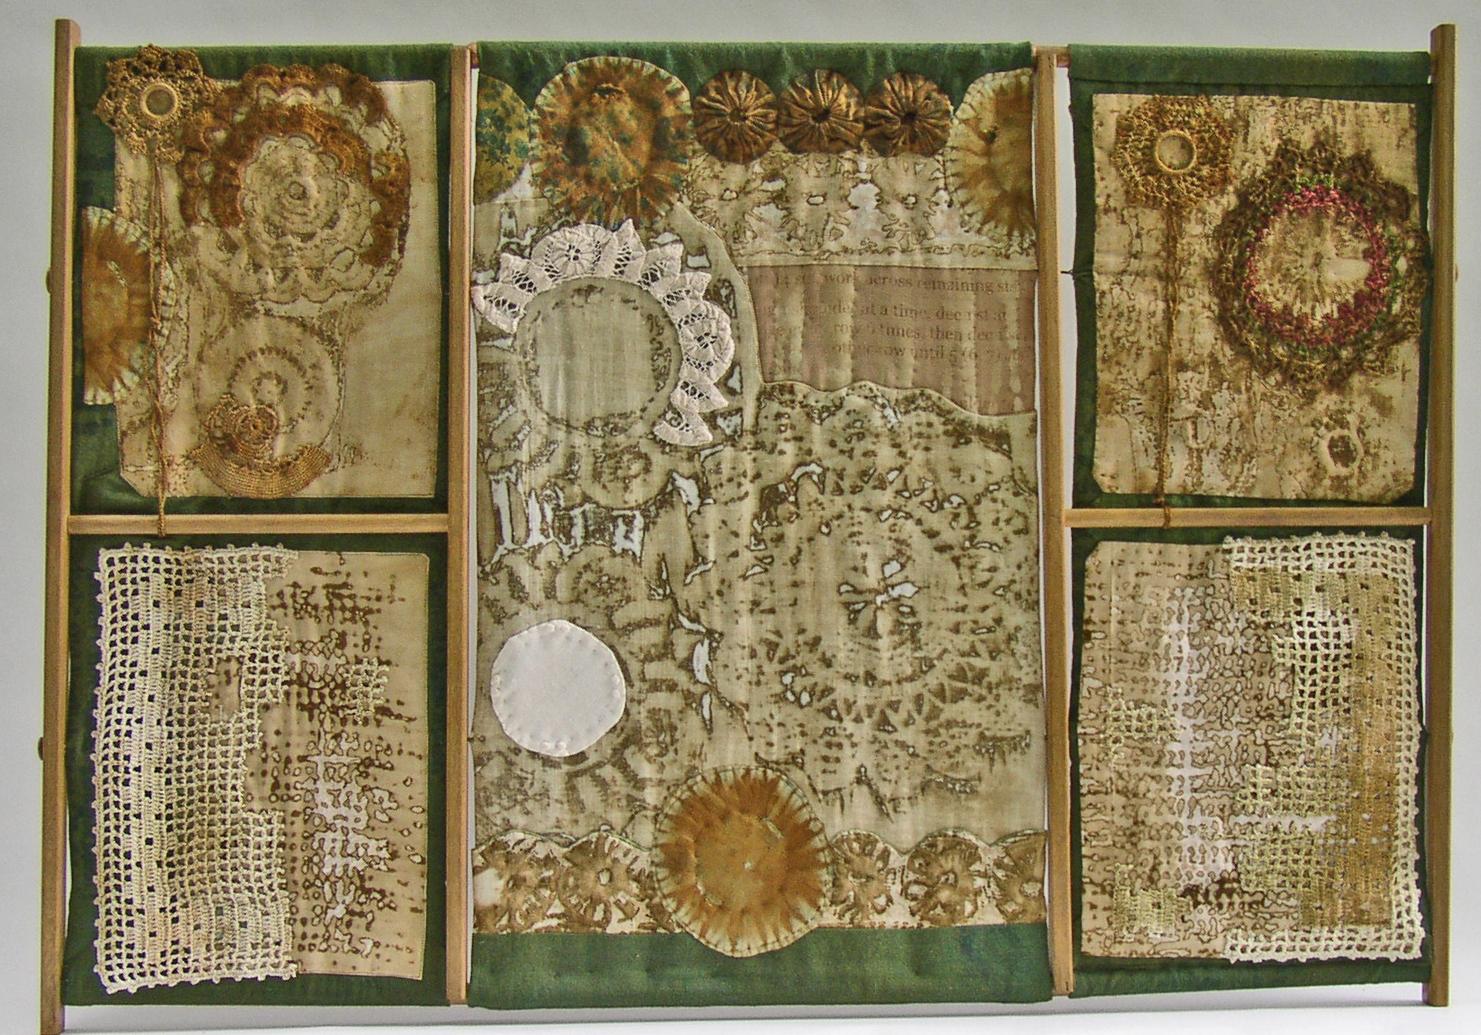 9Savona- Evidence of Textile Production #2.jpg